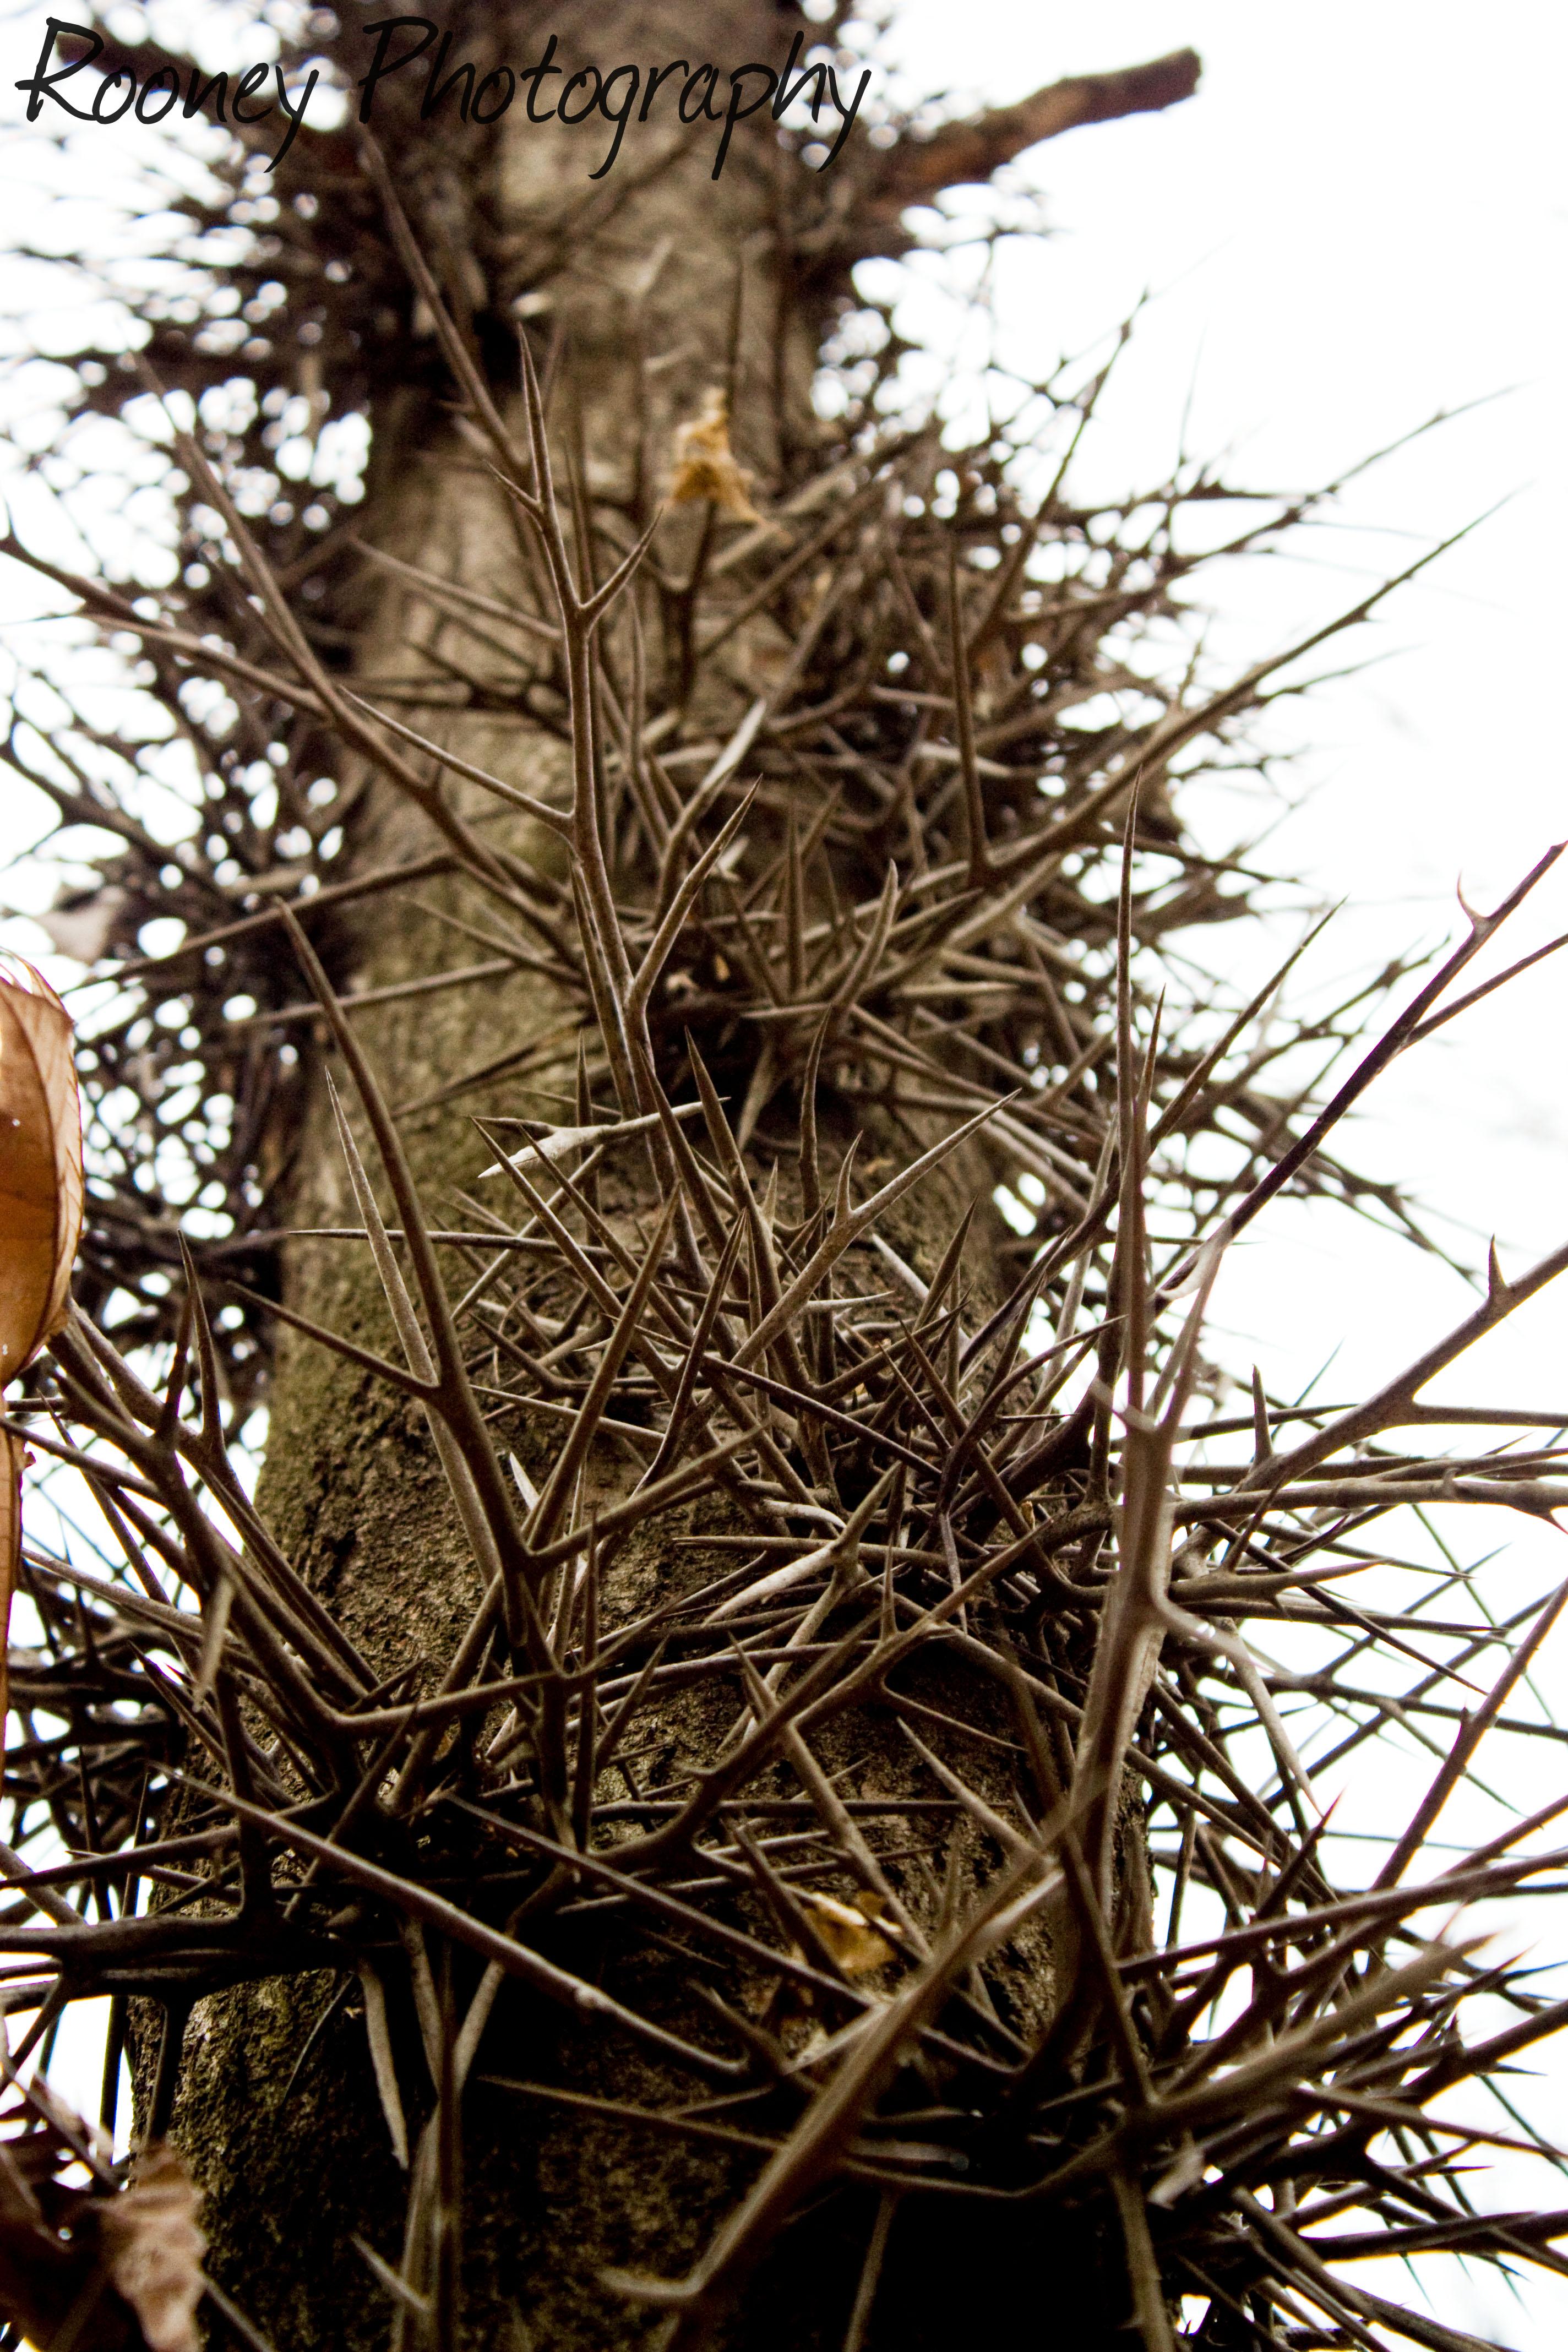 thorny trees rooney photography